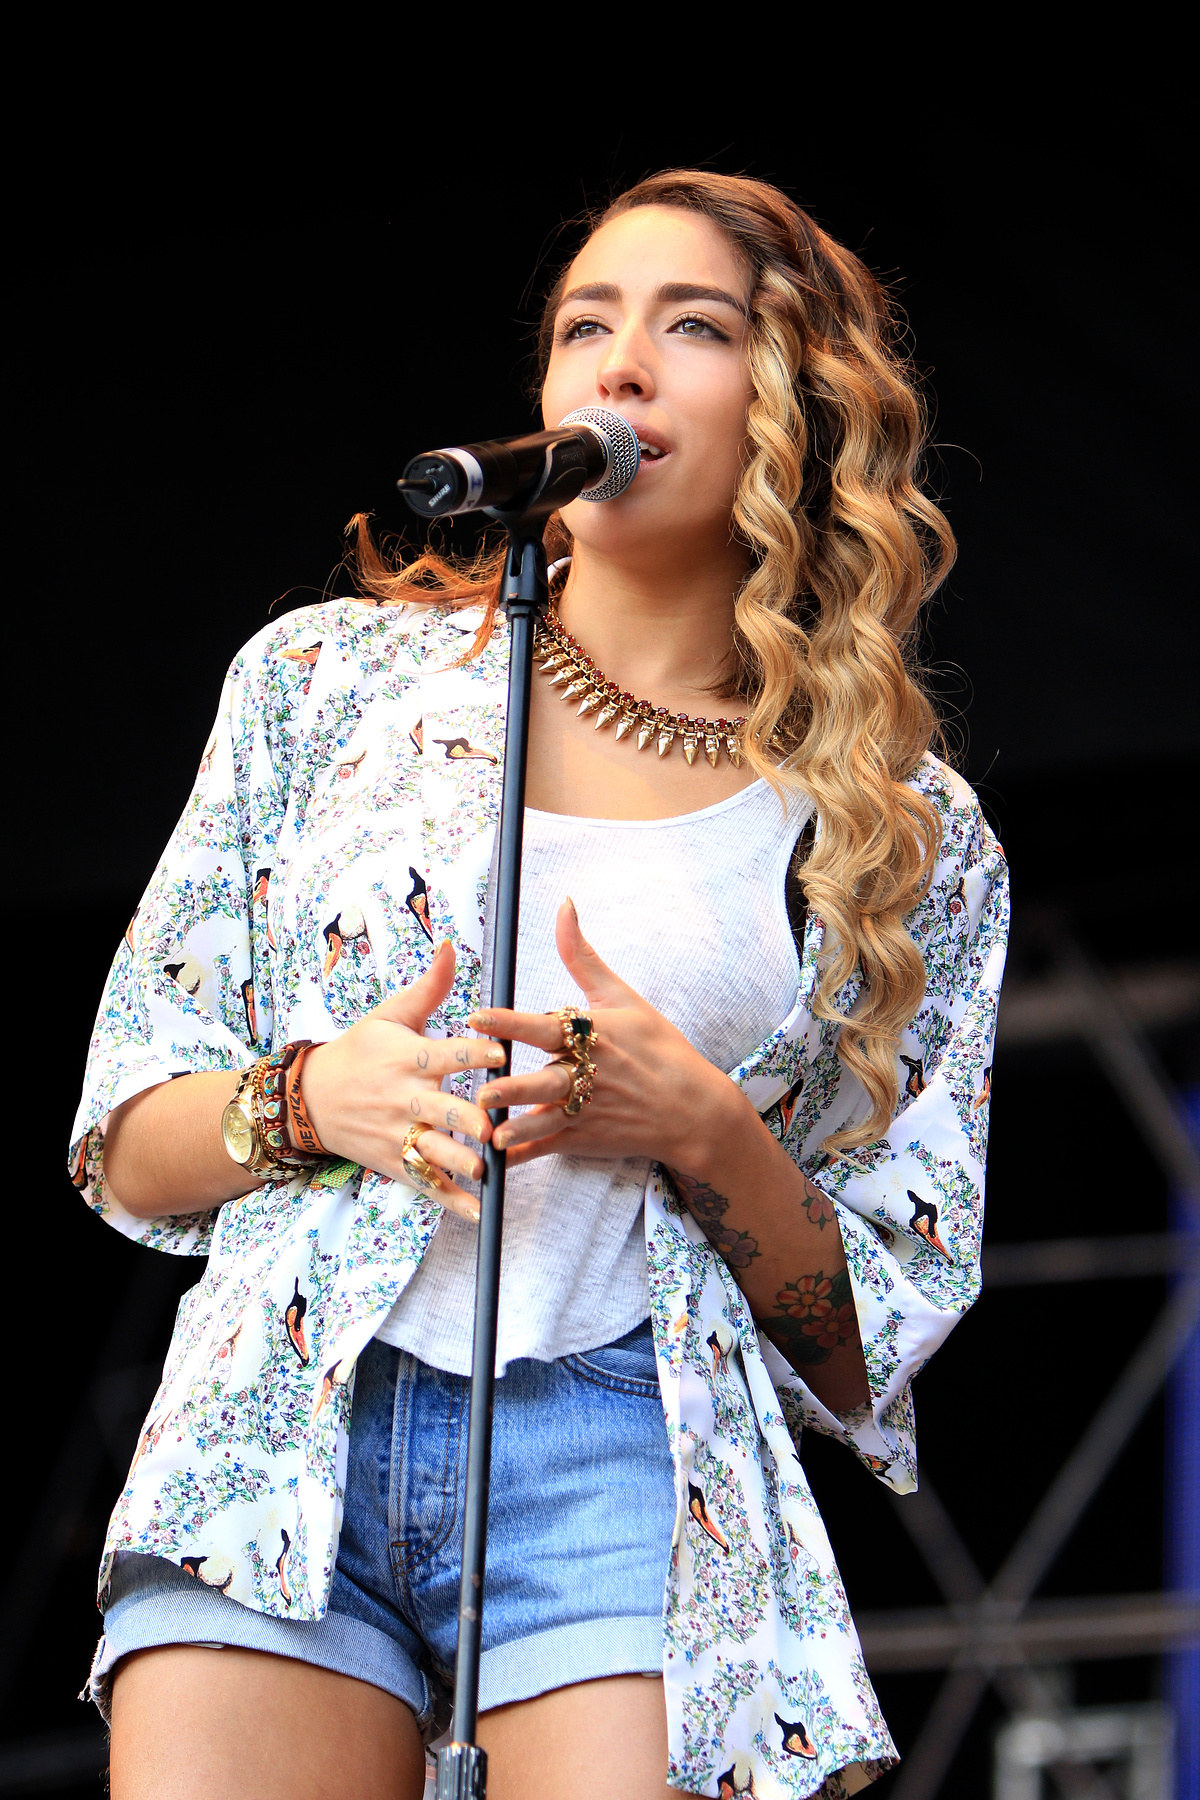 Delilah - Bingley Music Live 2012 (portrait)